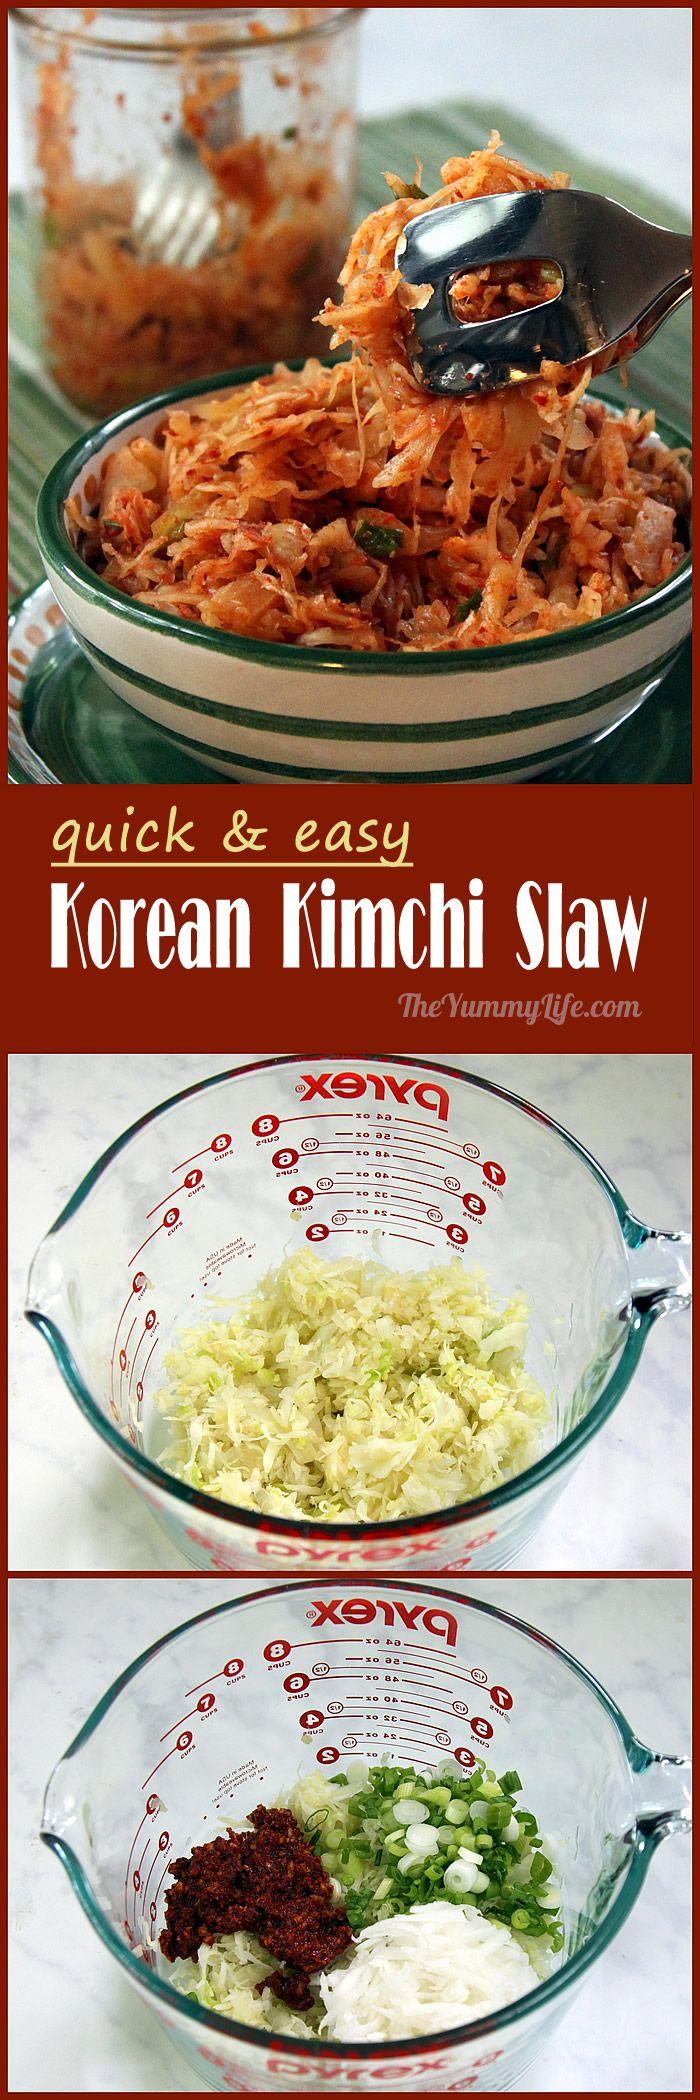 Quick And Easy Korean Kimchi Cabbage Slaw